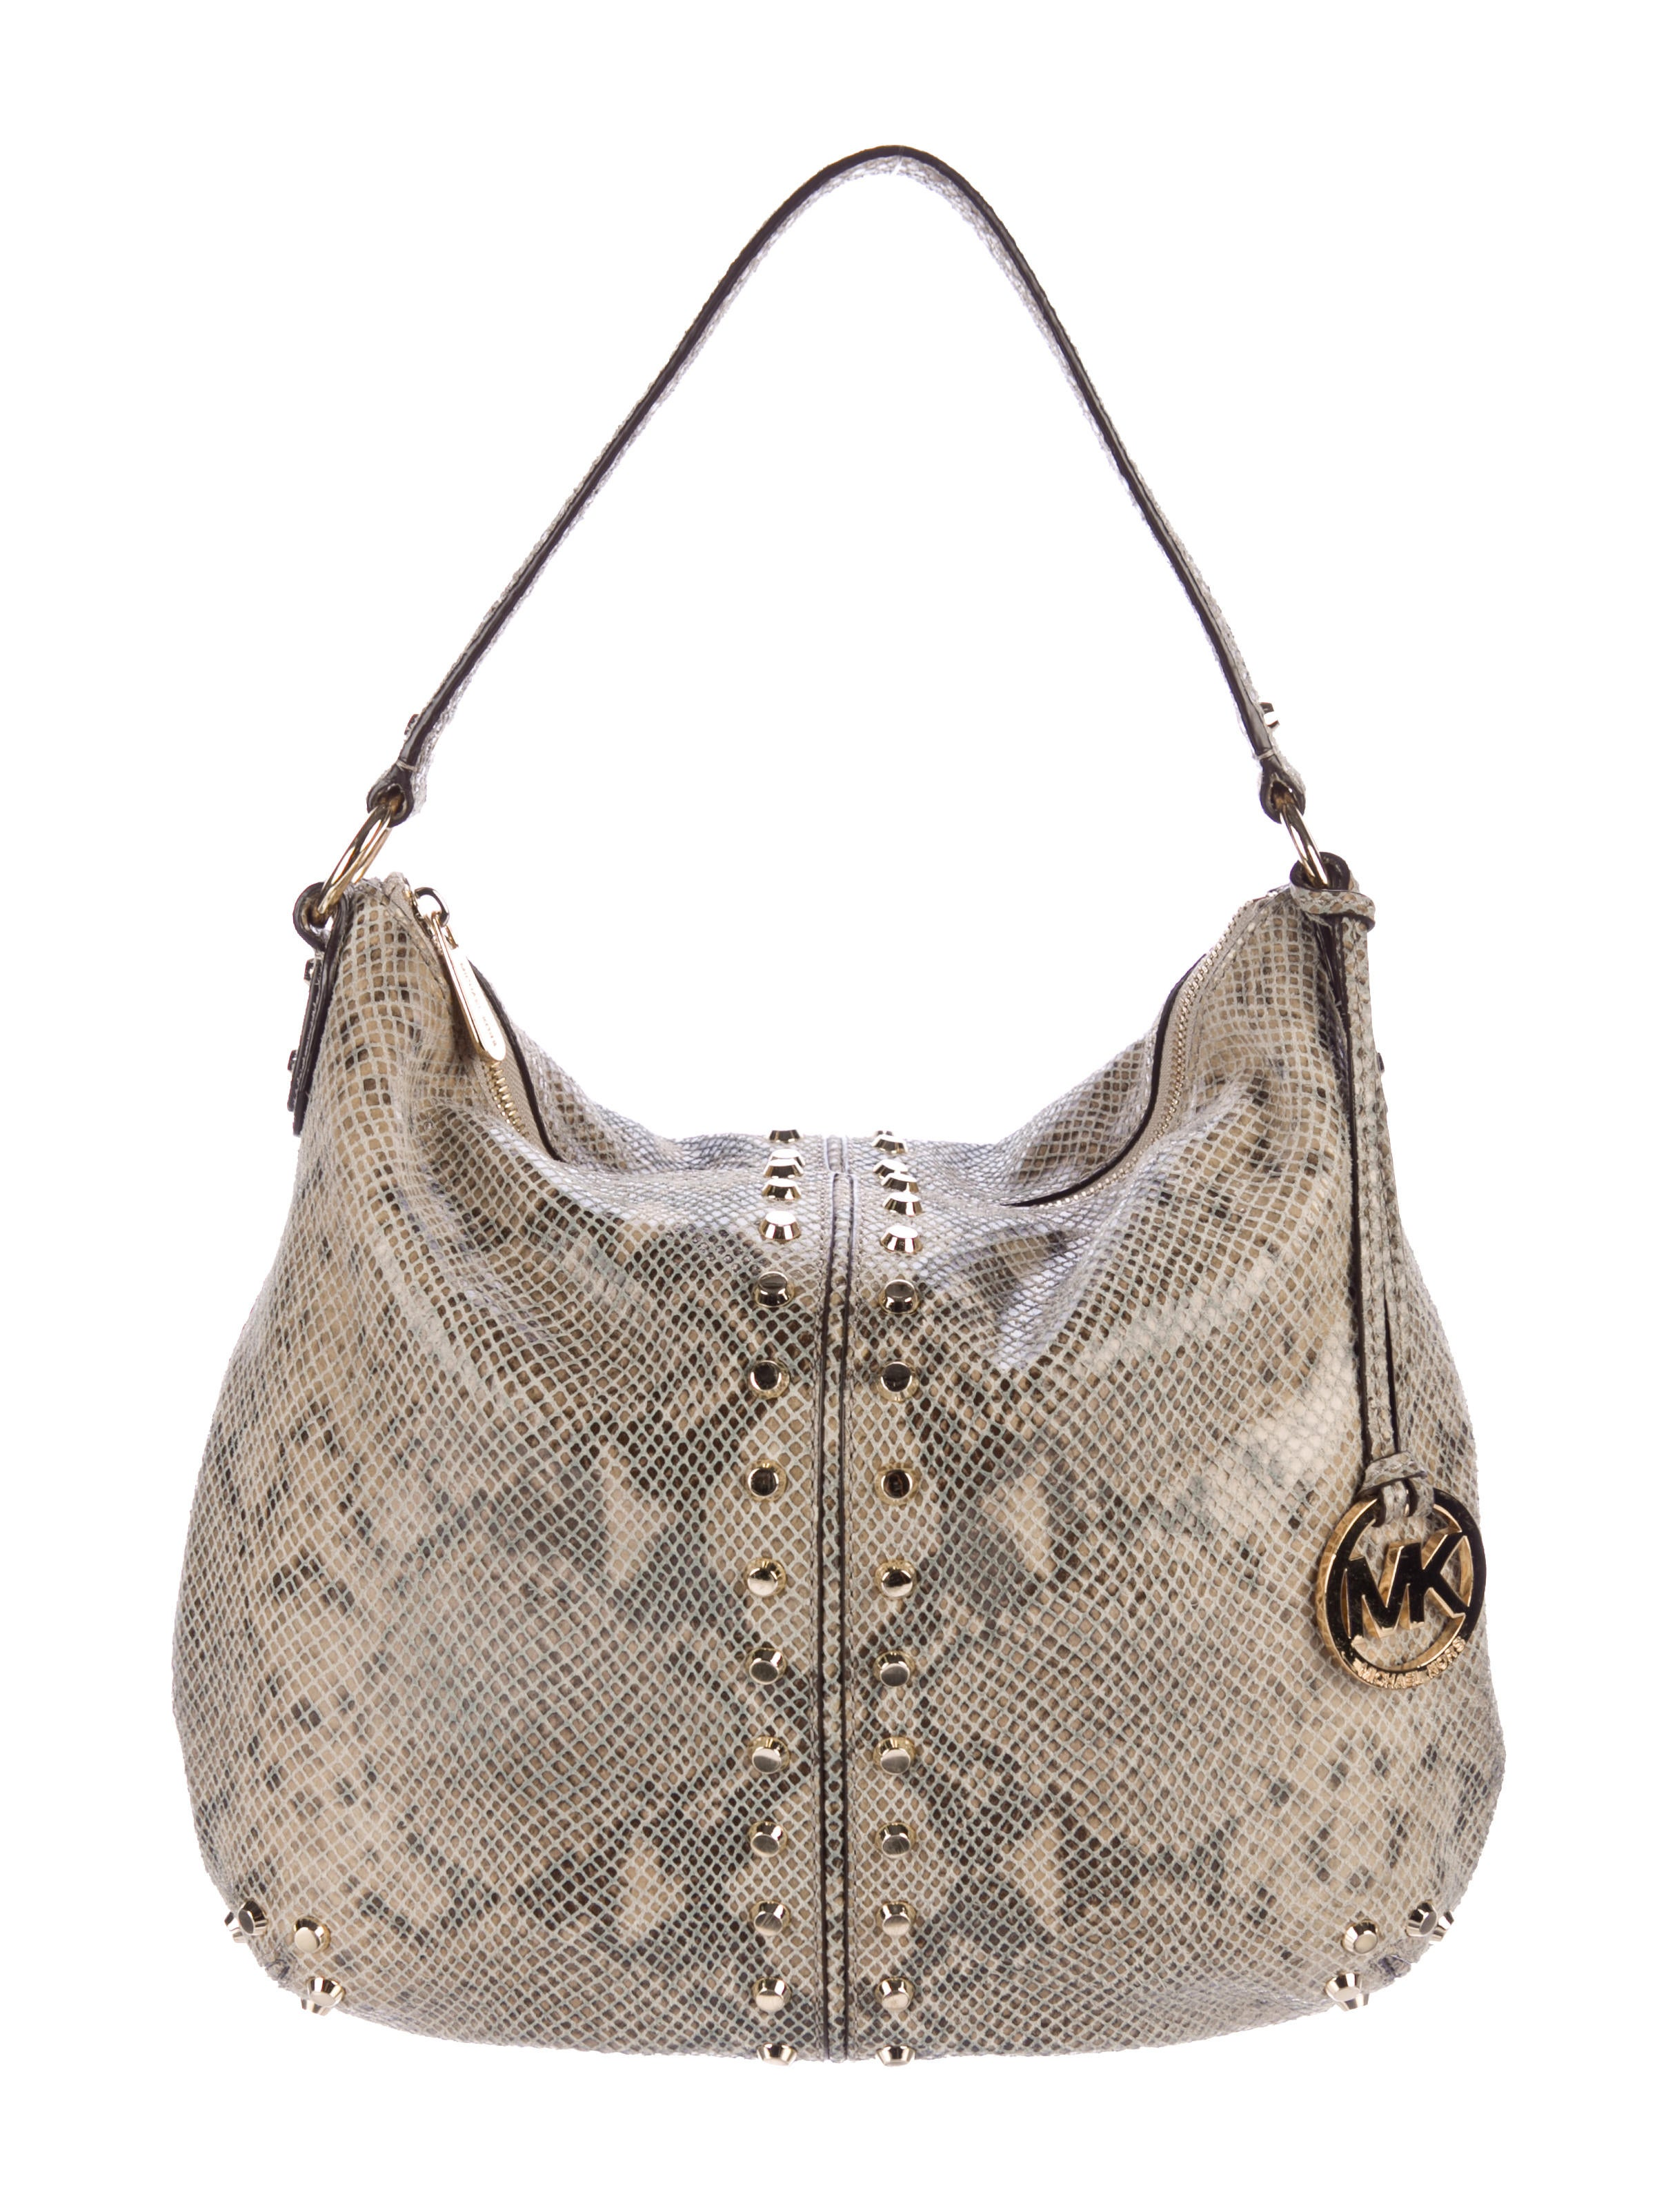 405ae251d093 Michael Michael Kors Uptown Astor Satchel Bag - Handbags - WM523693 ...